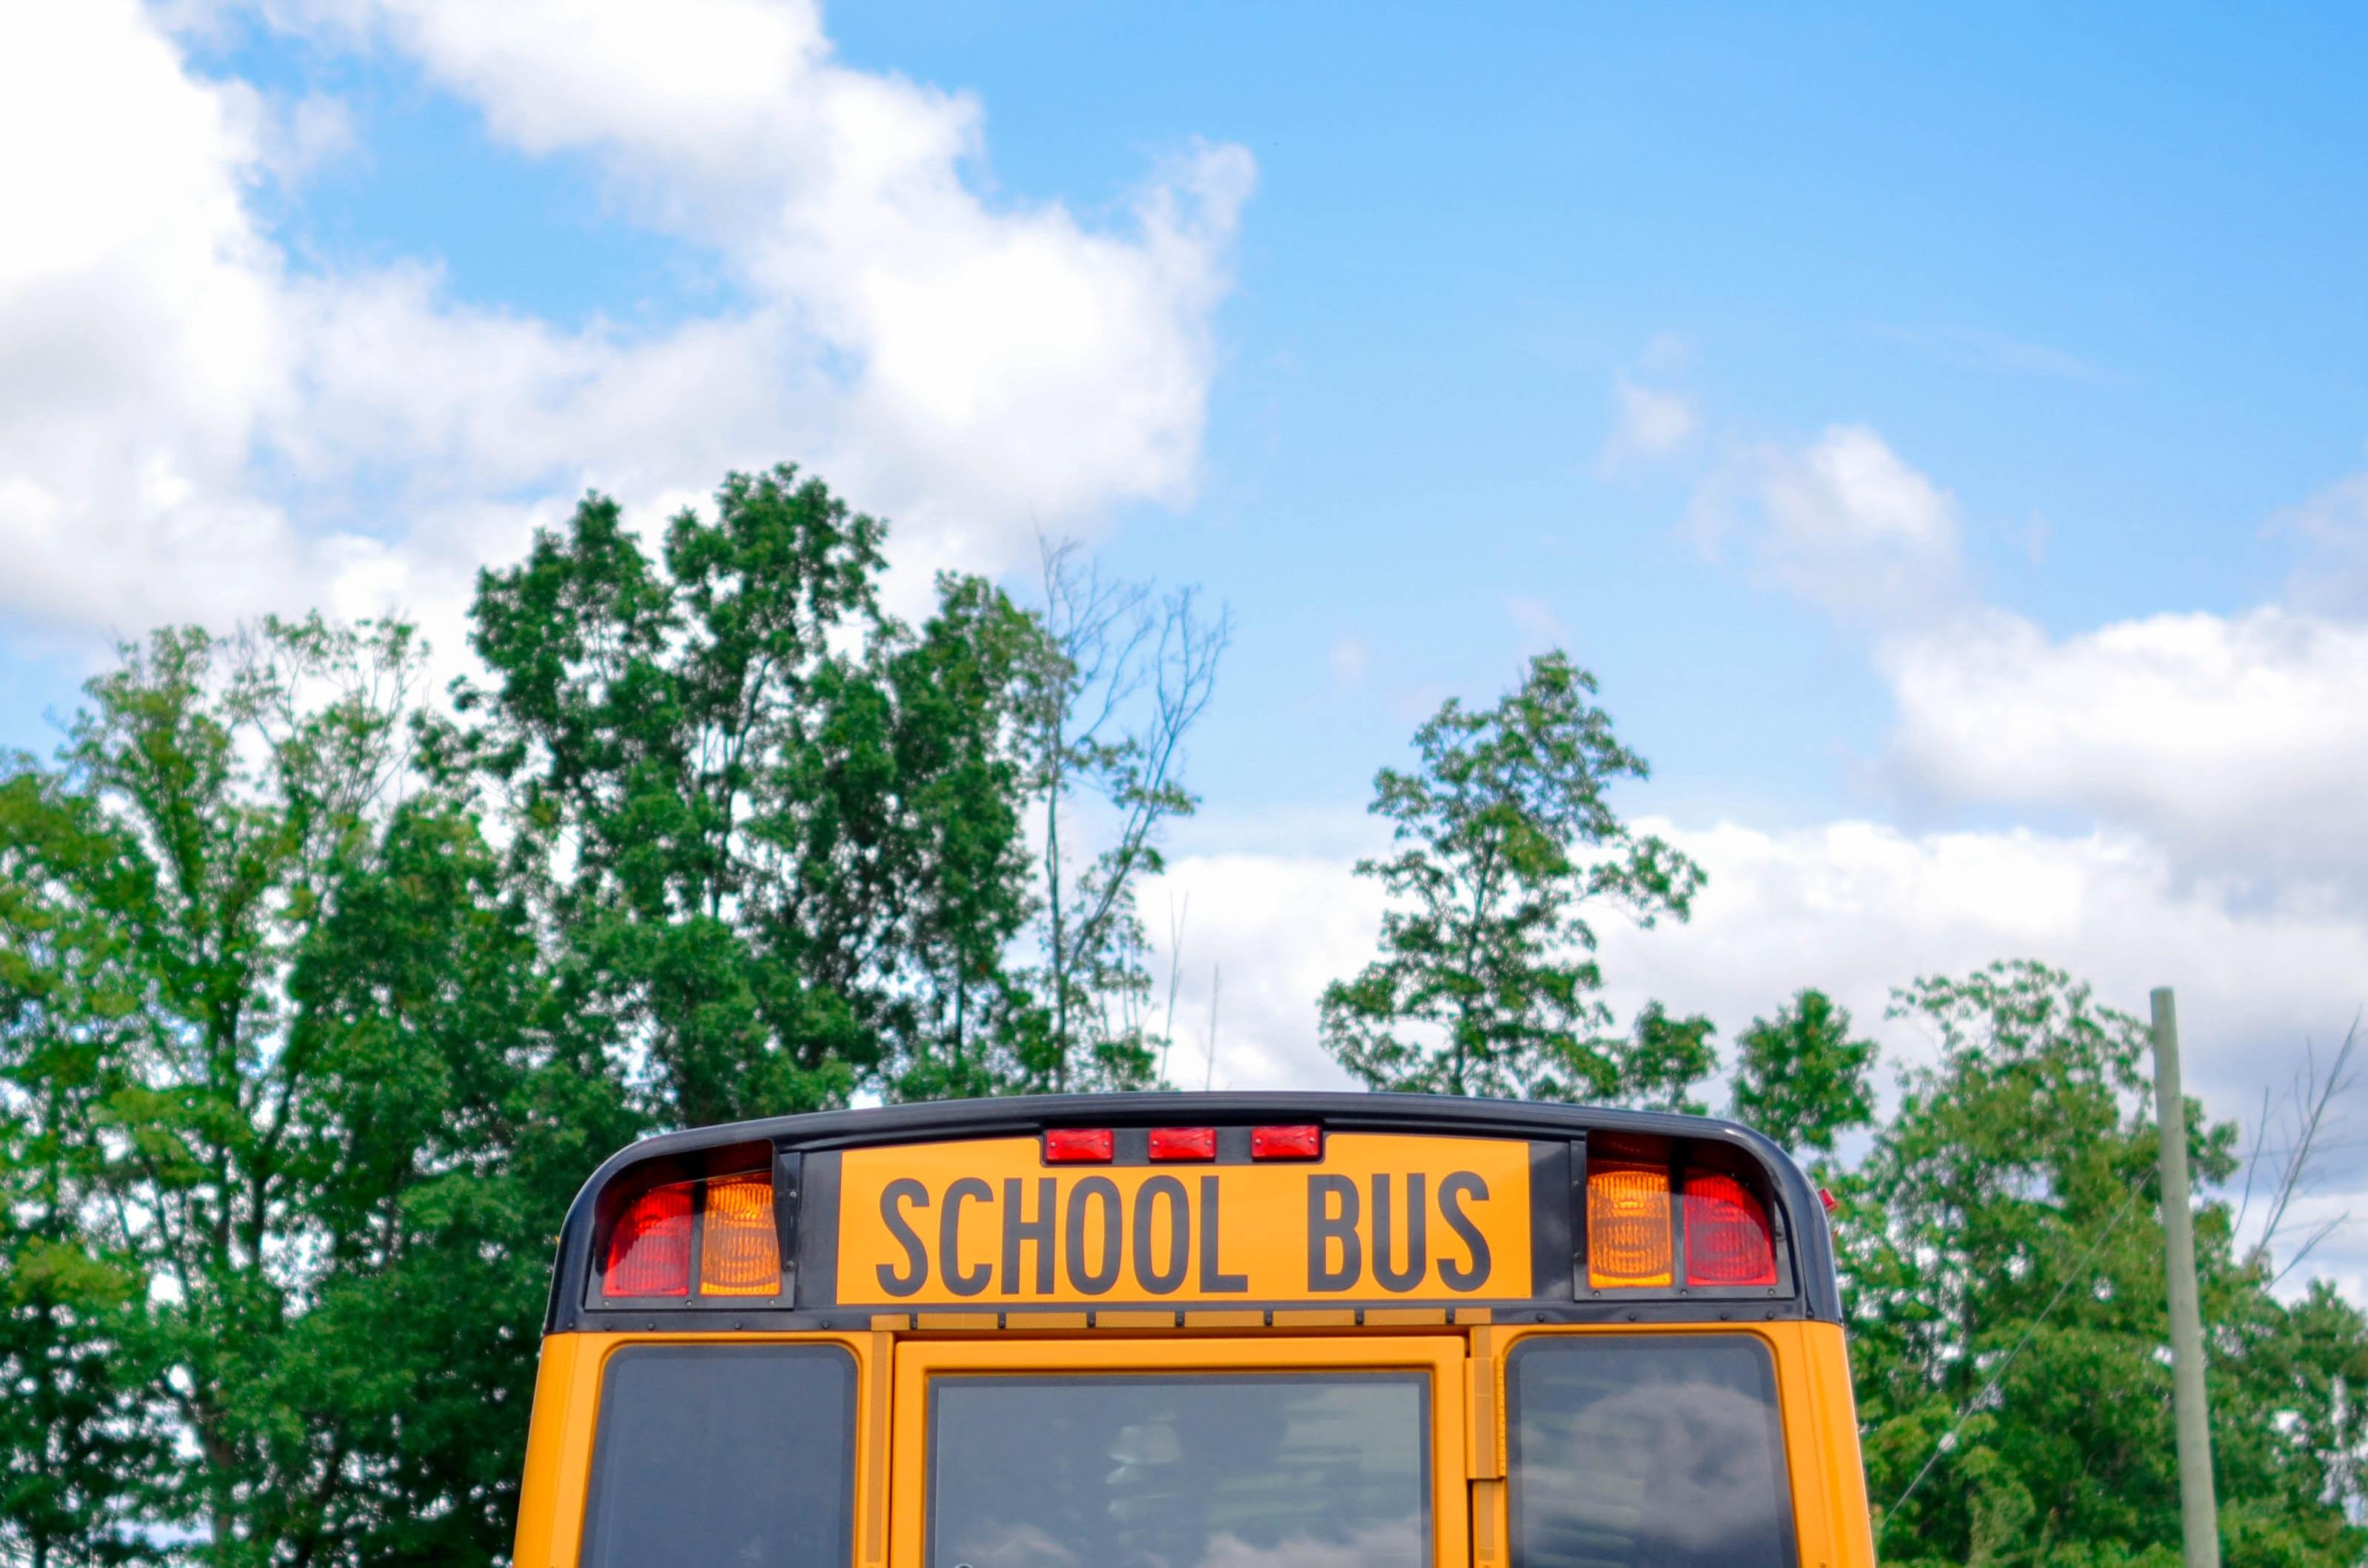 Blue School Bus school-bus stories